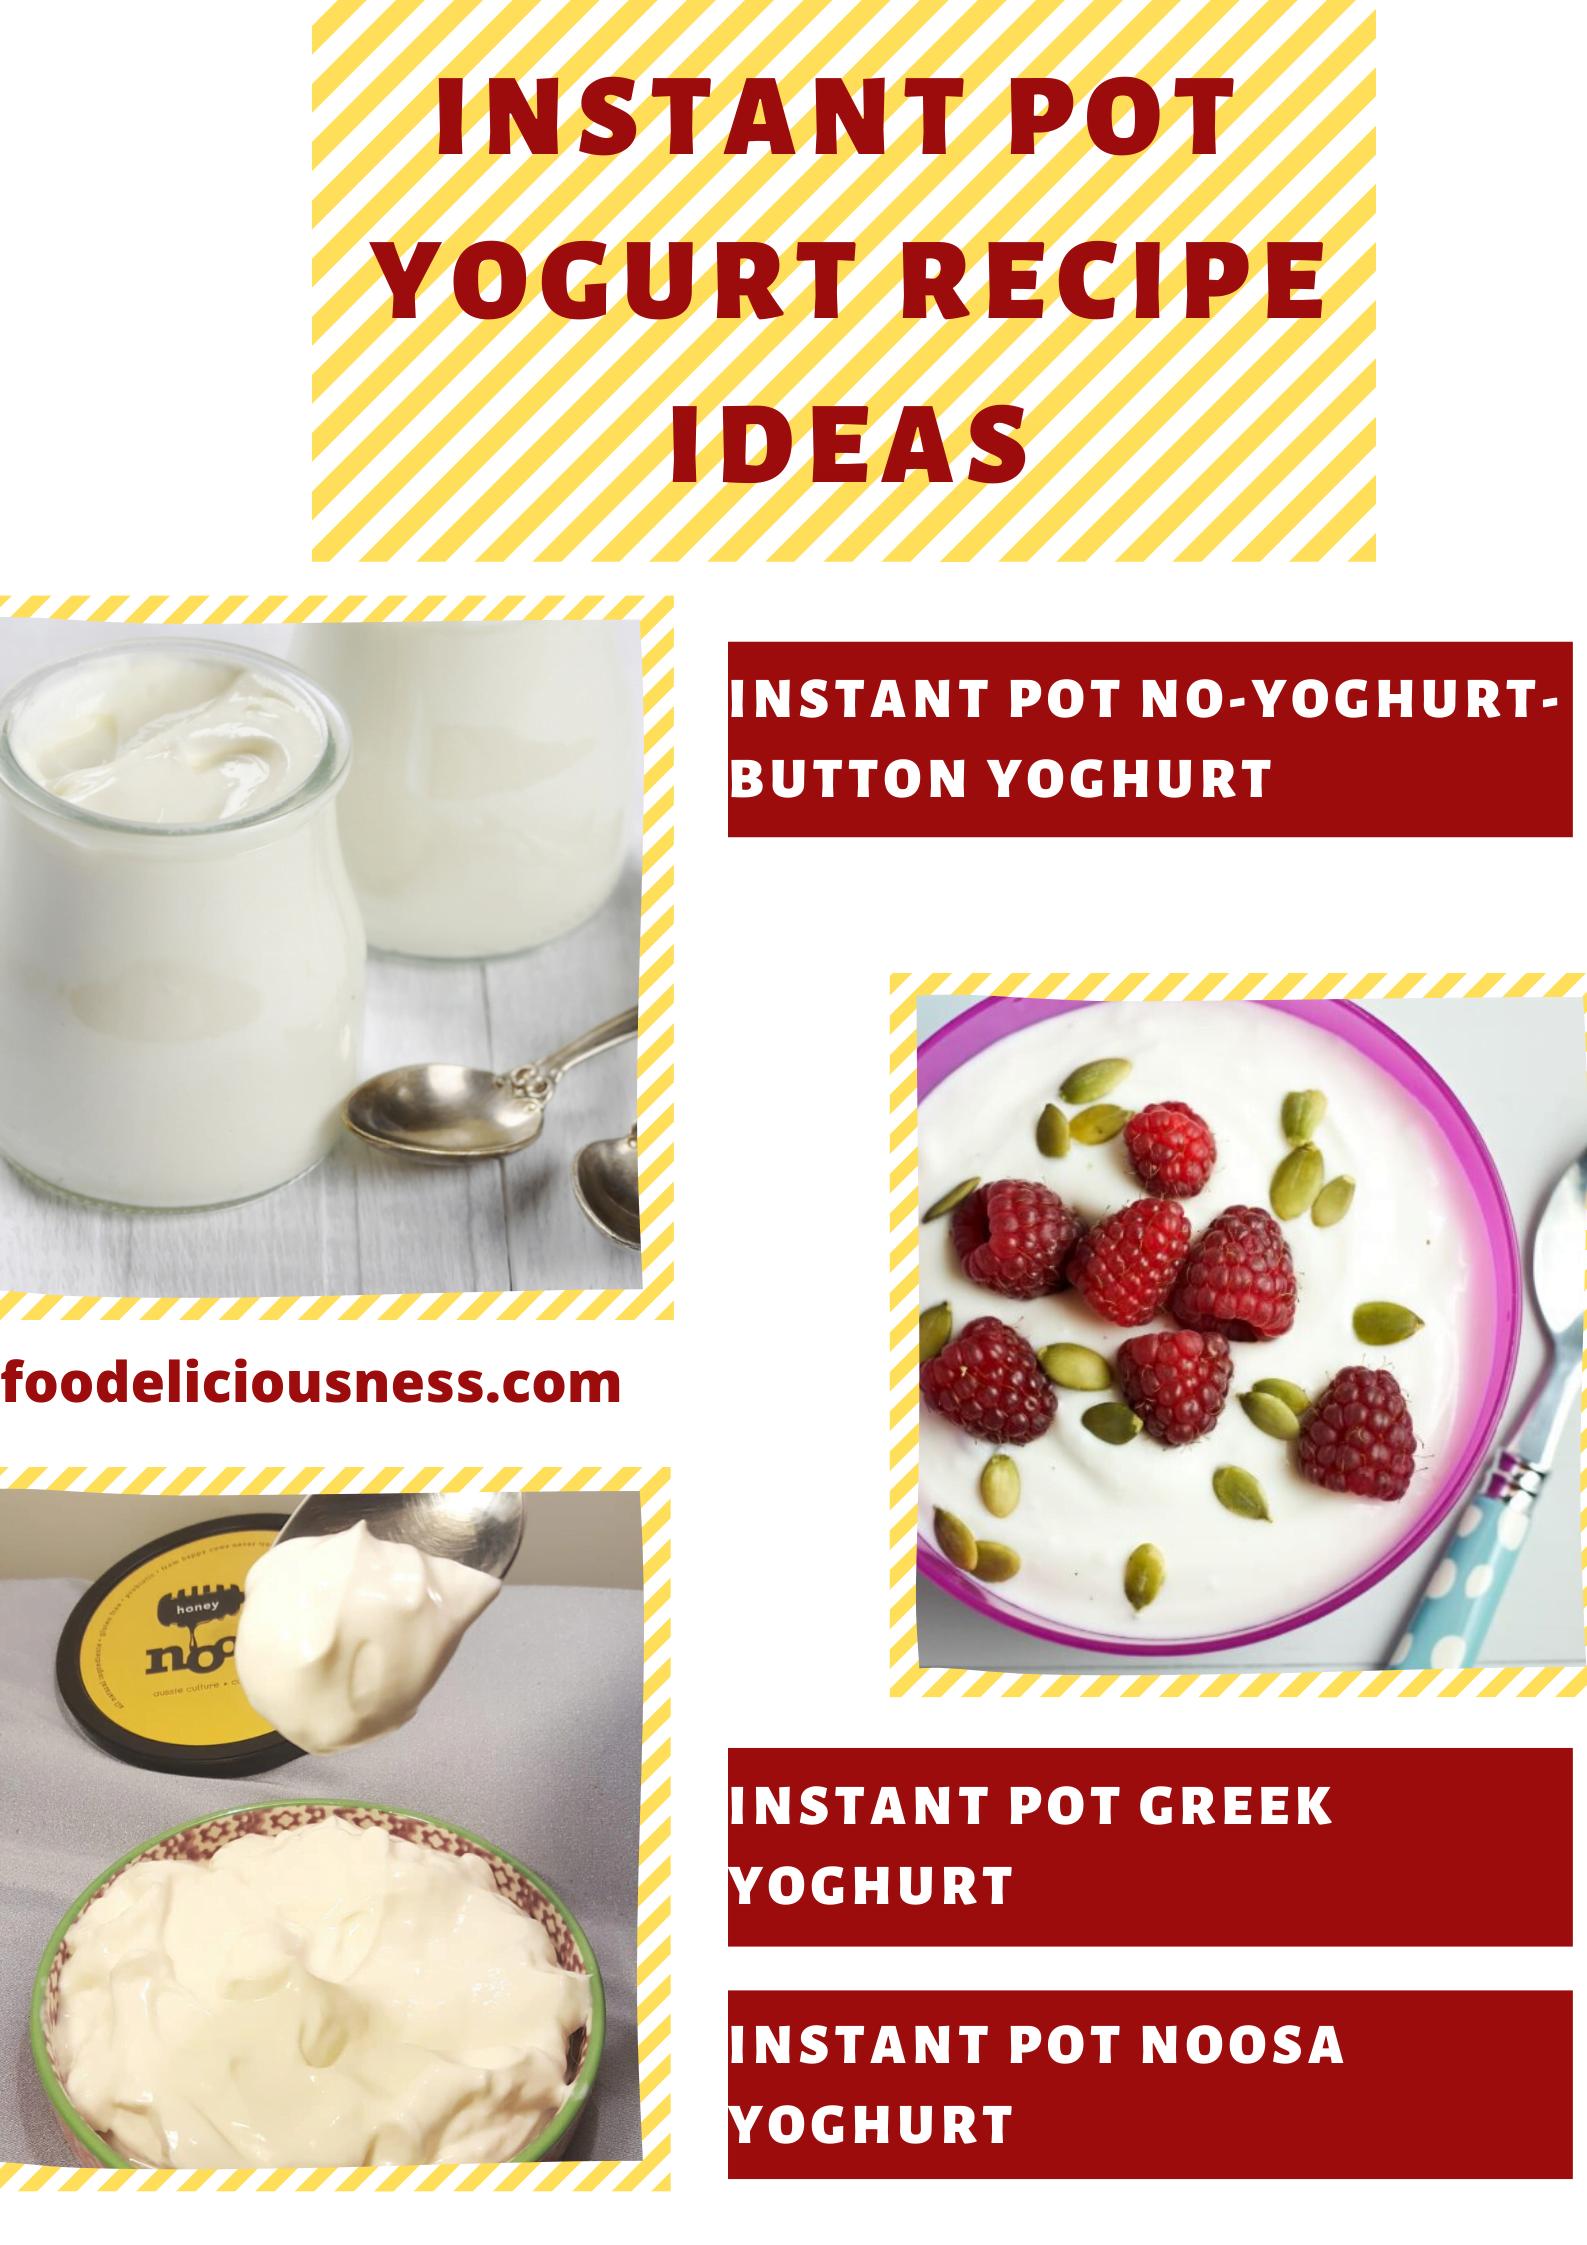 instant pot yogurt recipe ideas 1